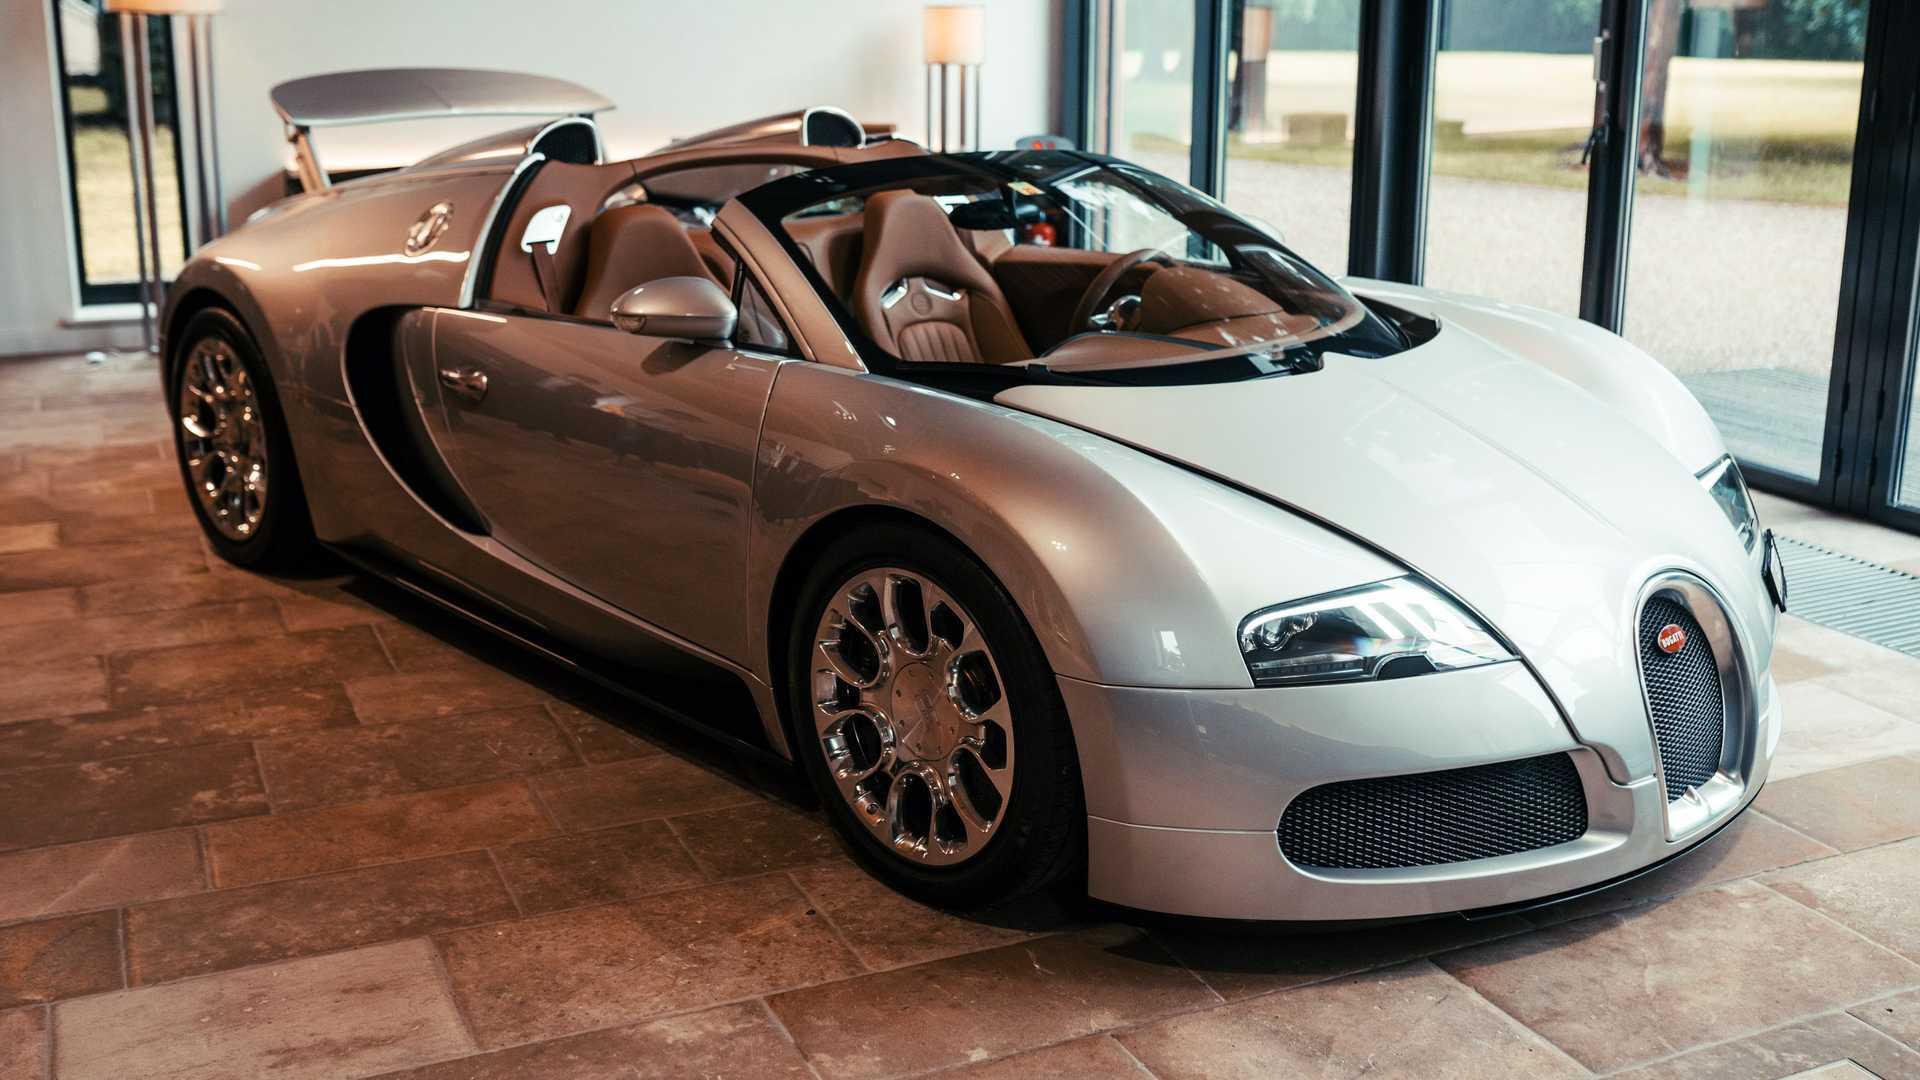 Exterior view of the 2008 Bugatti Grand Sport restoration